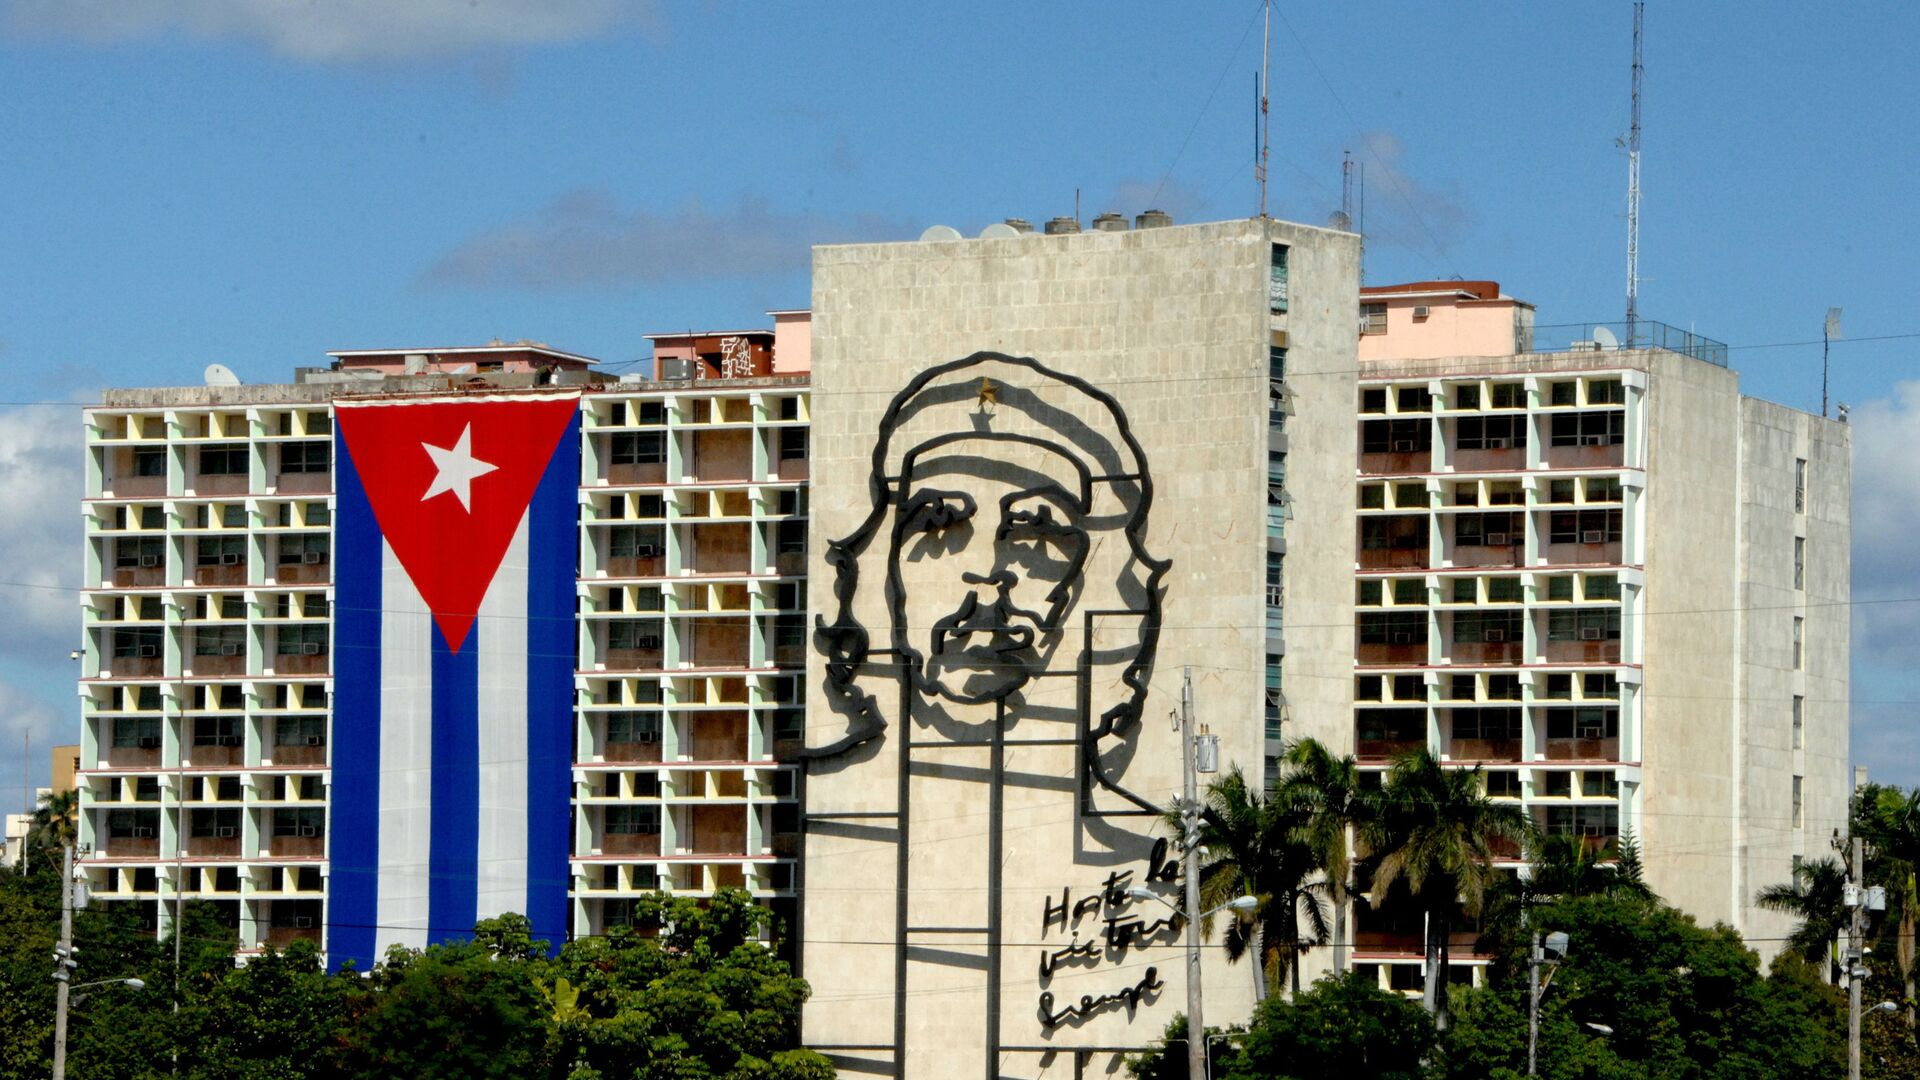 Bandera cubana en La Habana, capital de Cuba - Sputnik Mundo, 1920, 21.07.2021